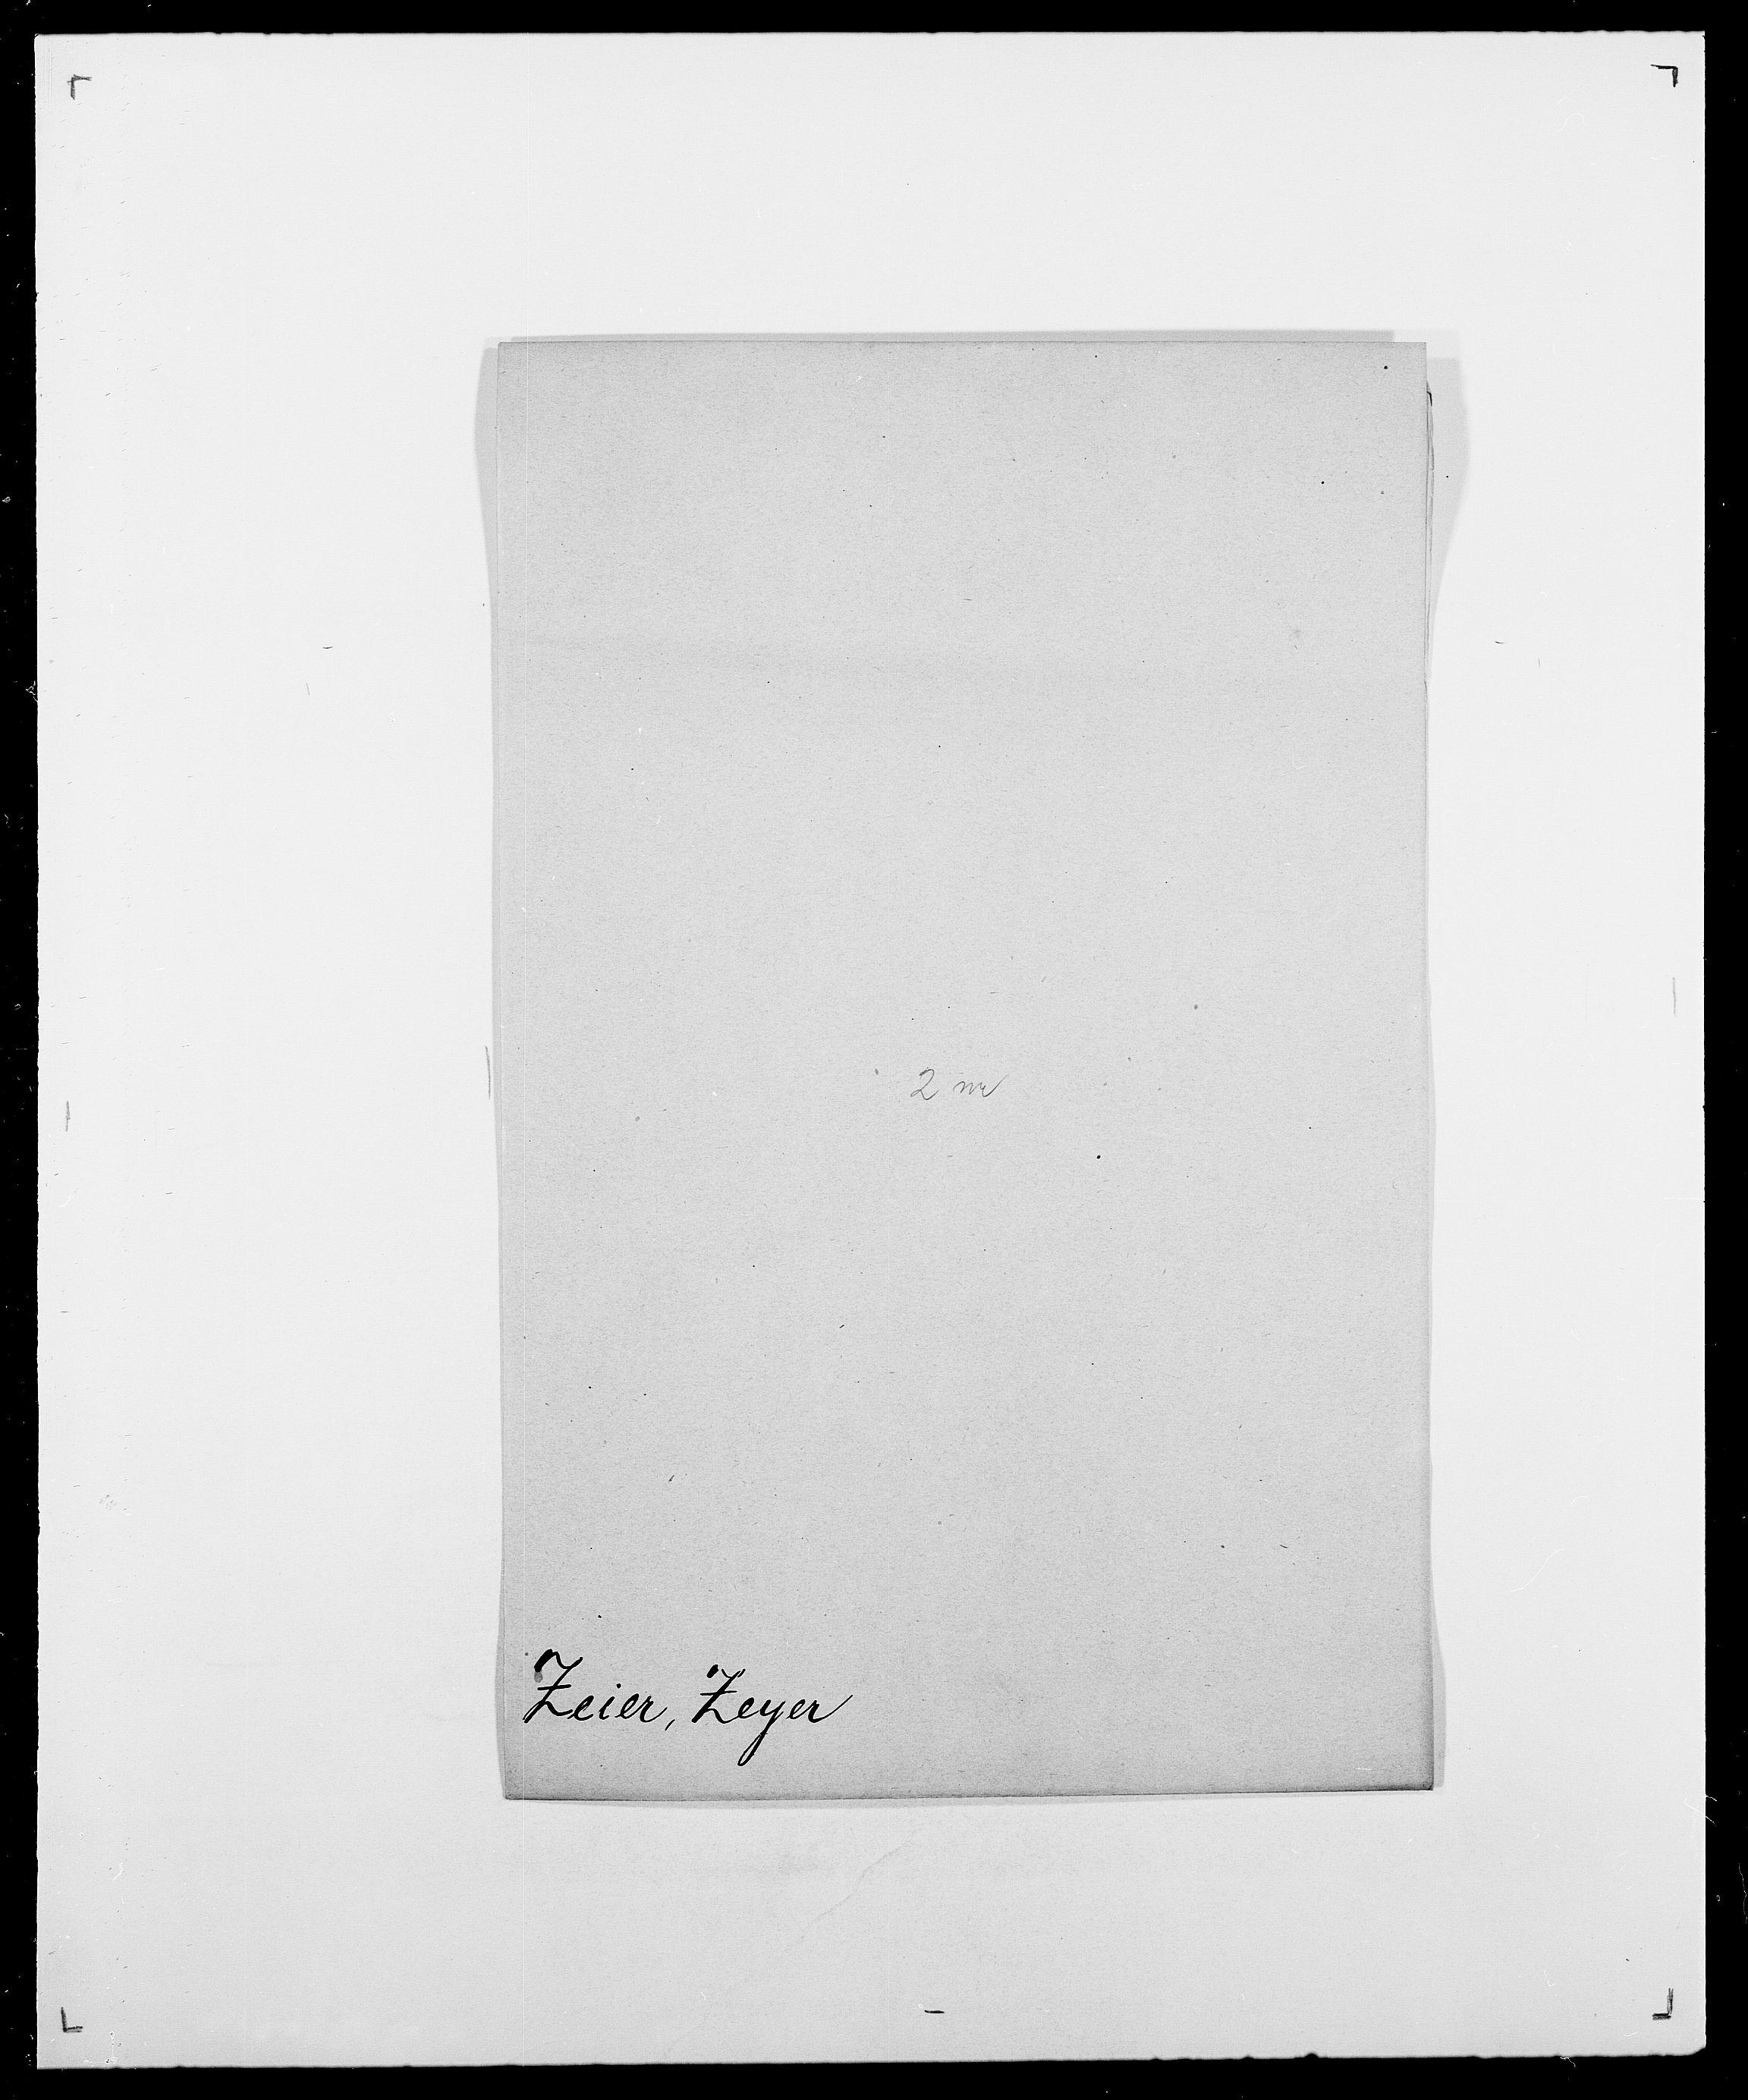 SAO, Delgobe, Charles Antoine - samling, D/Da/L0043: Wulfsberg - v. Zanten, s. 101